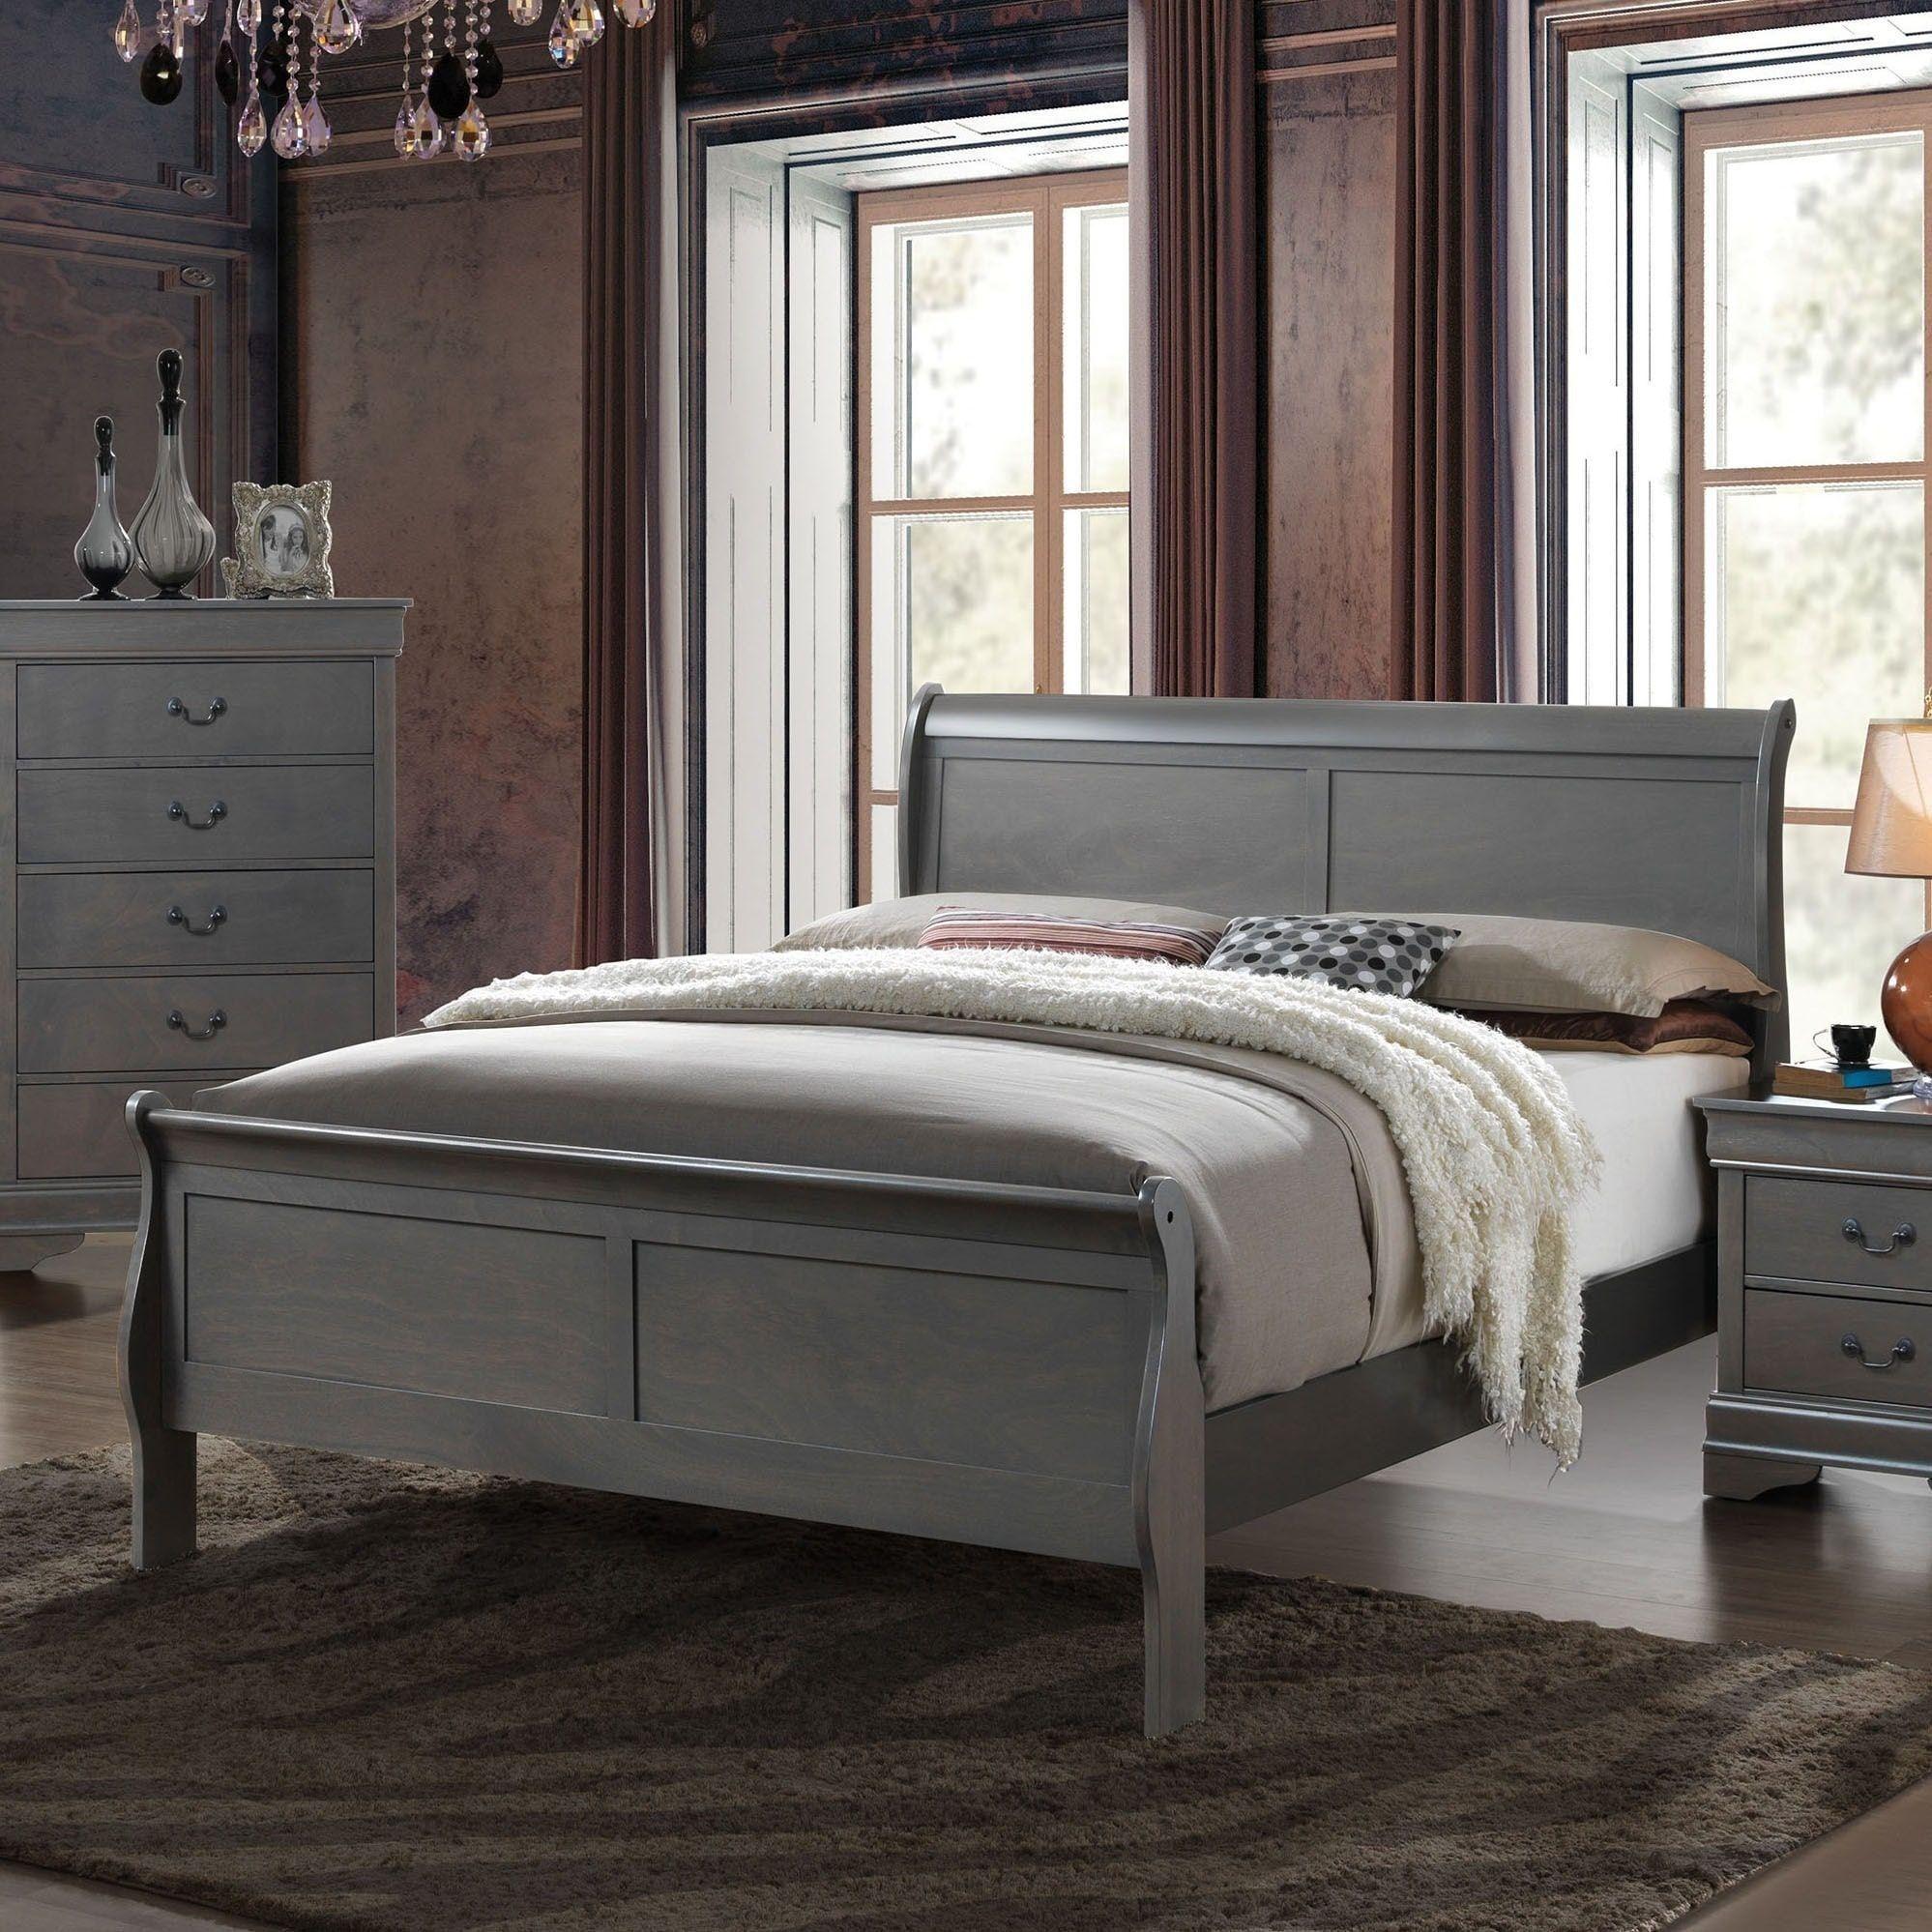 Craigslist Bedroom Sets - Creepingthyme.info